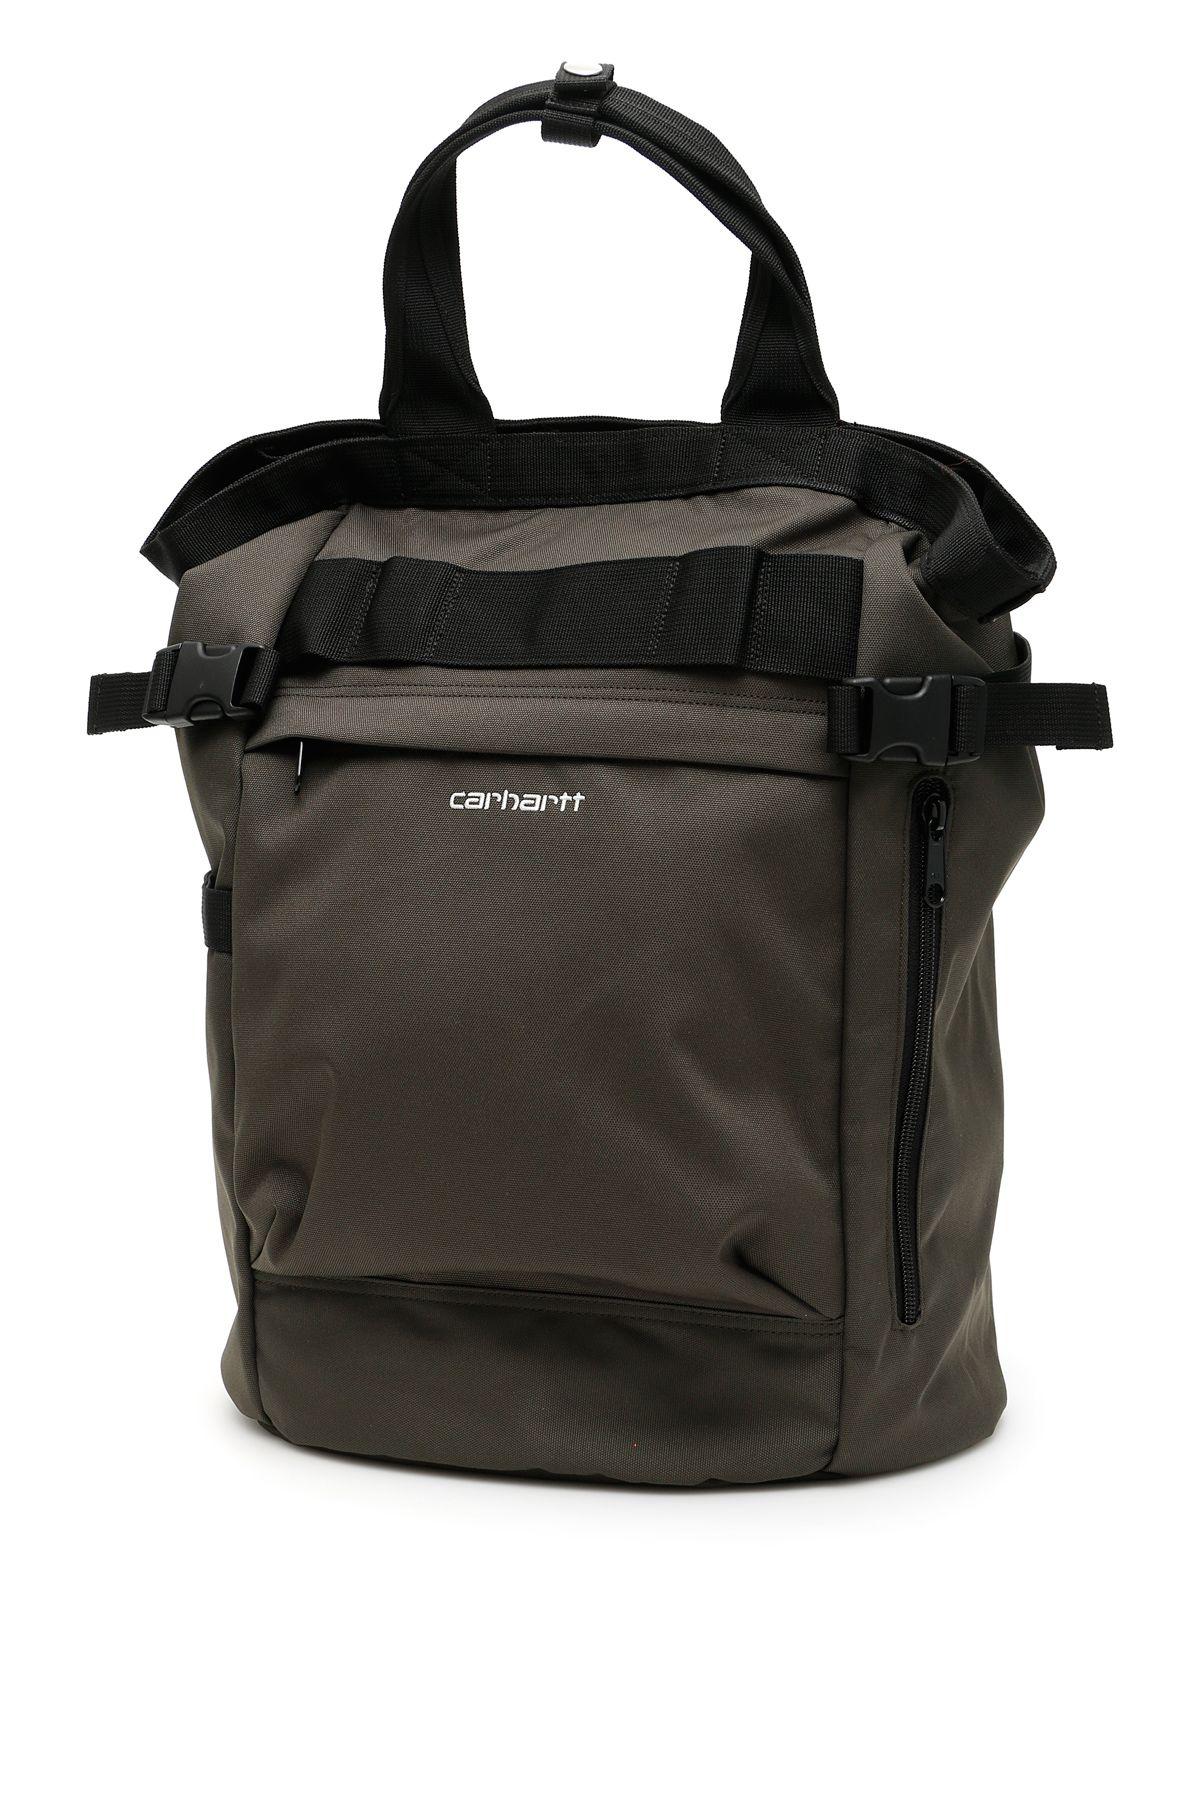 Carhartt Payton Carrier Backpack